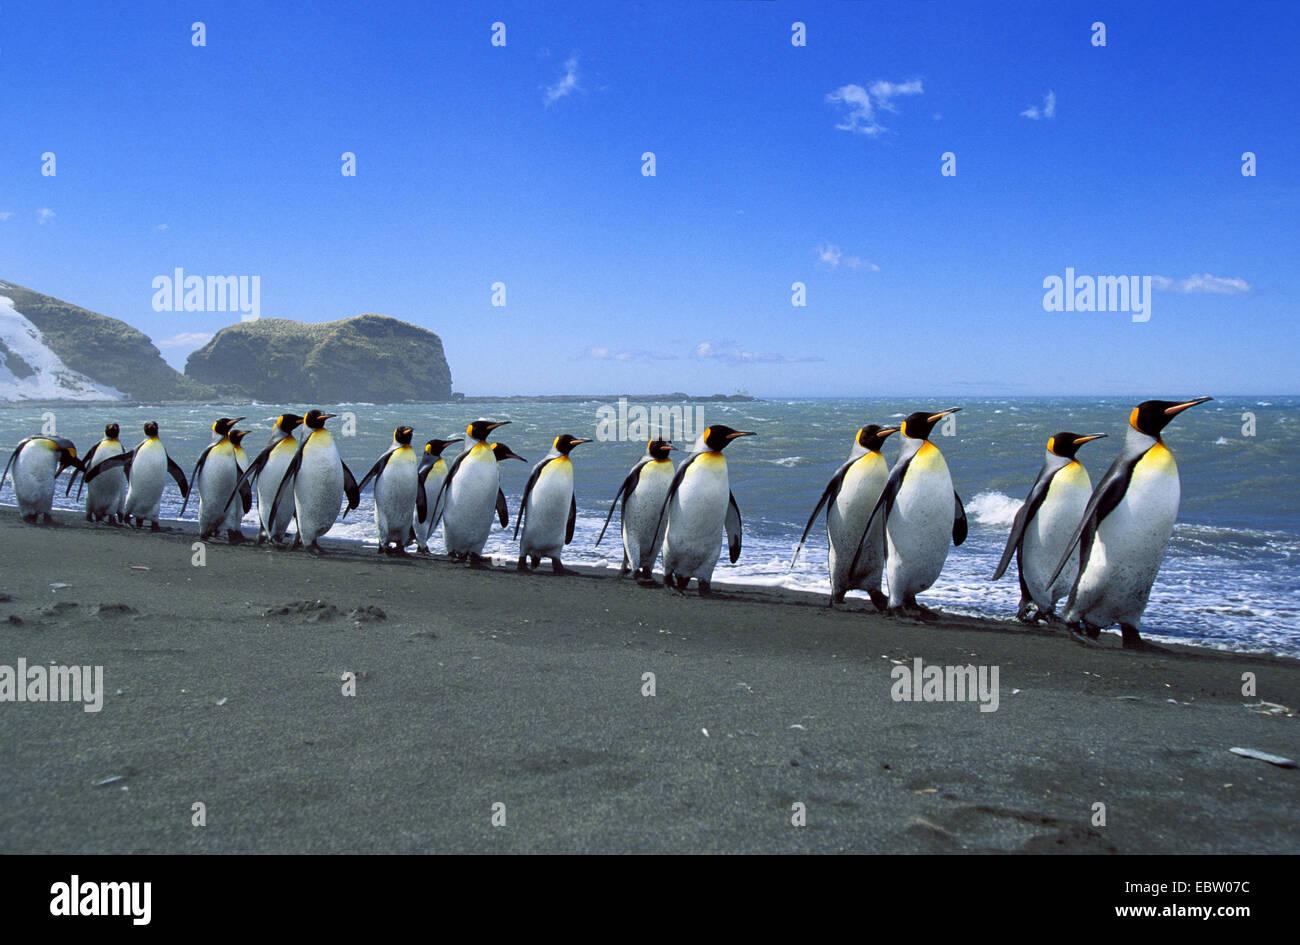 König Pinguin (Aptenodytes Patagonicus), Königspinguine aufgereiht, Suedgeorgien Stockfoto